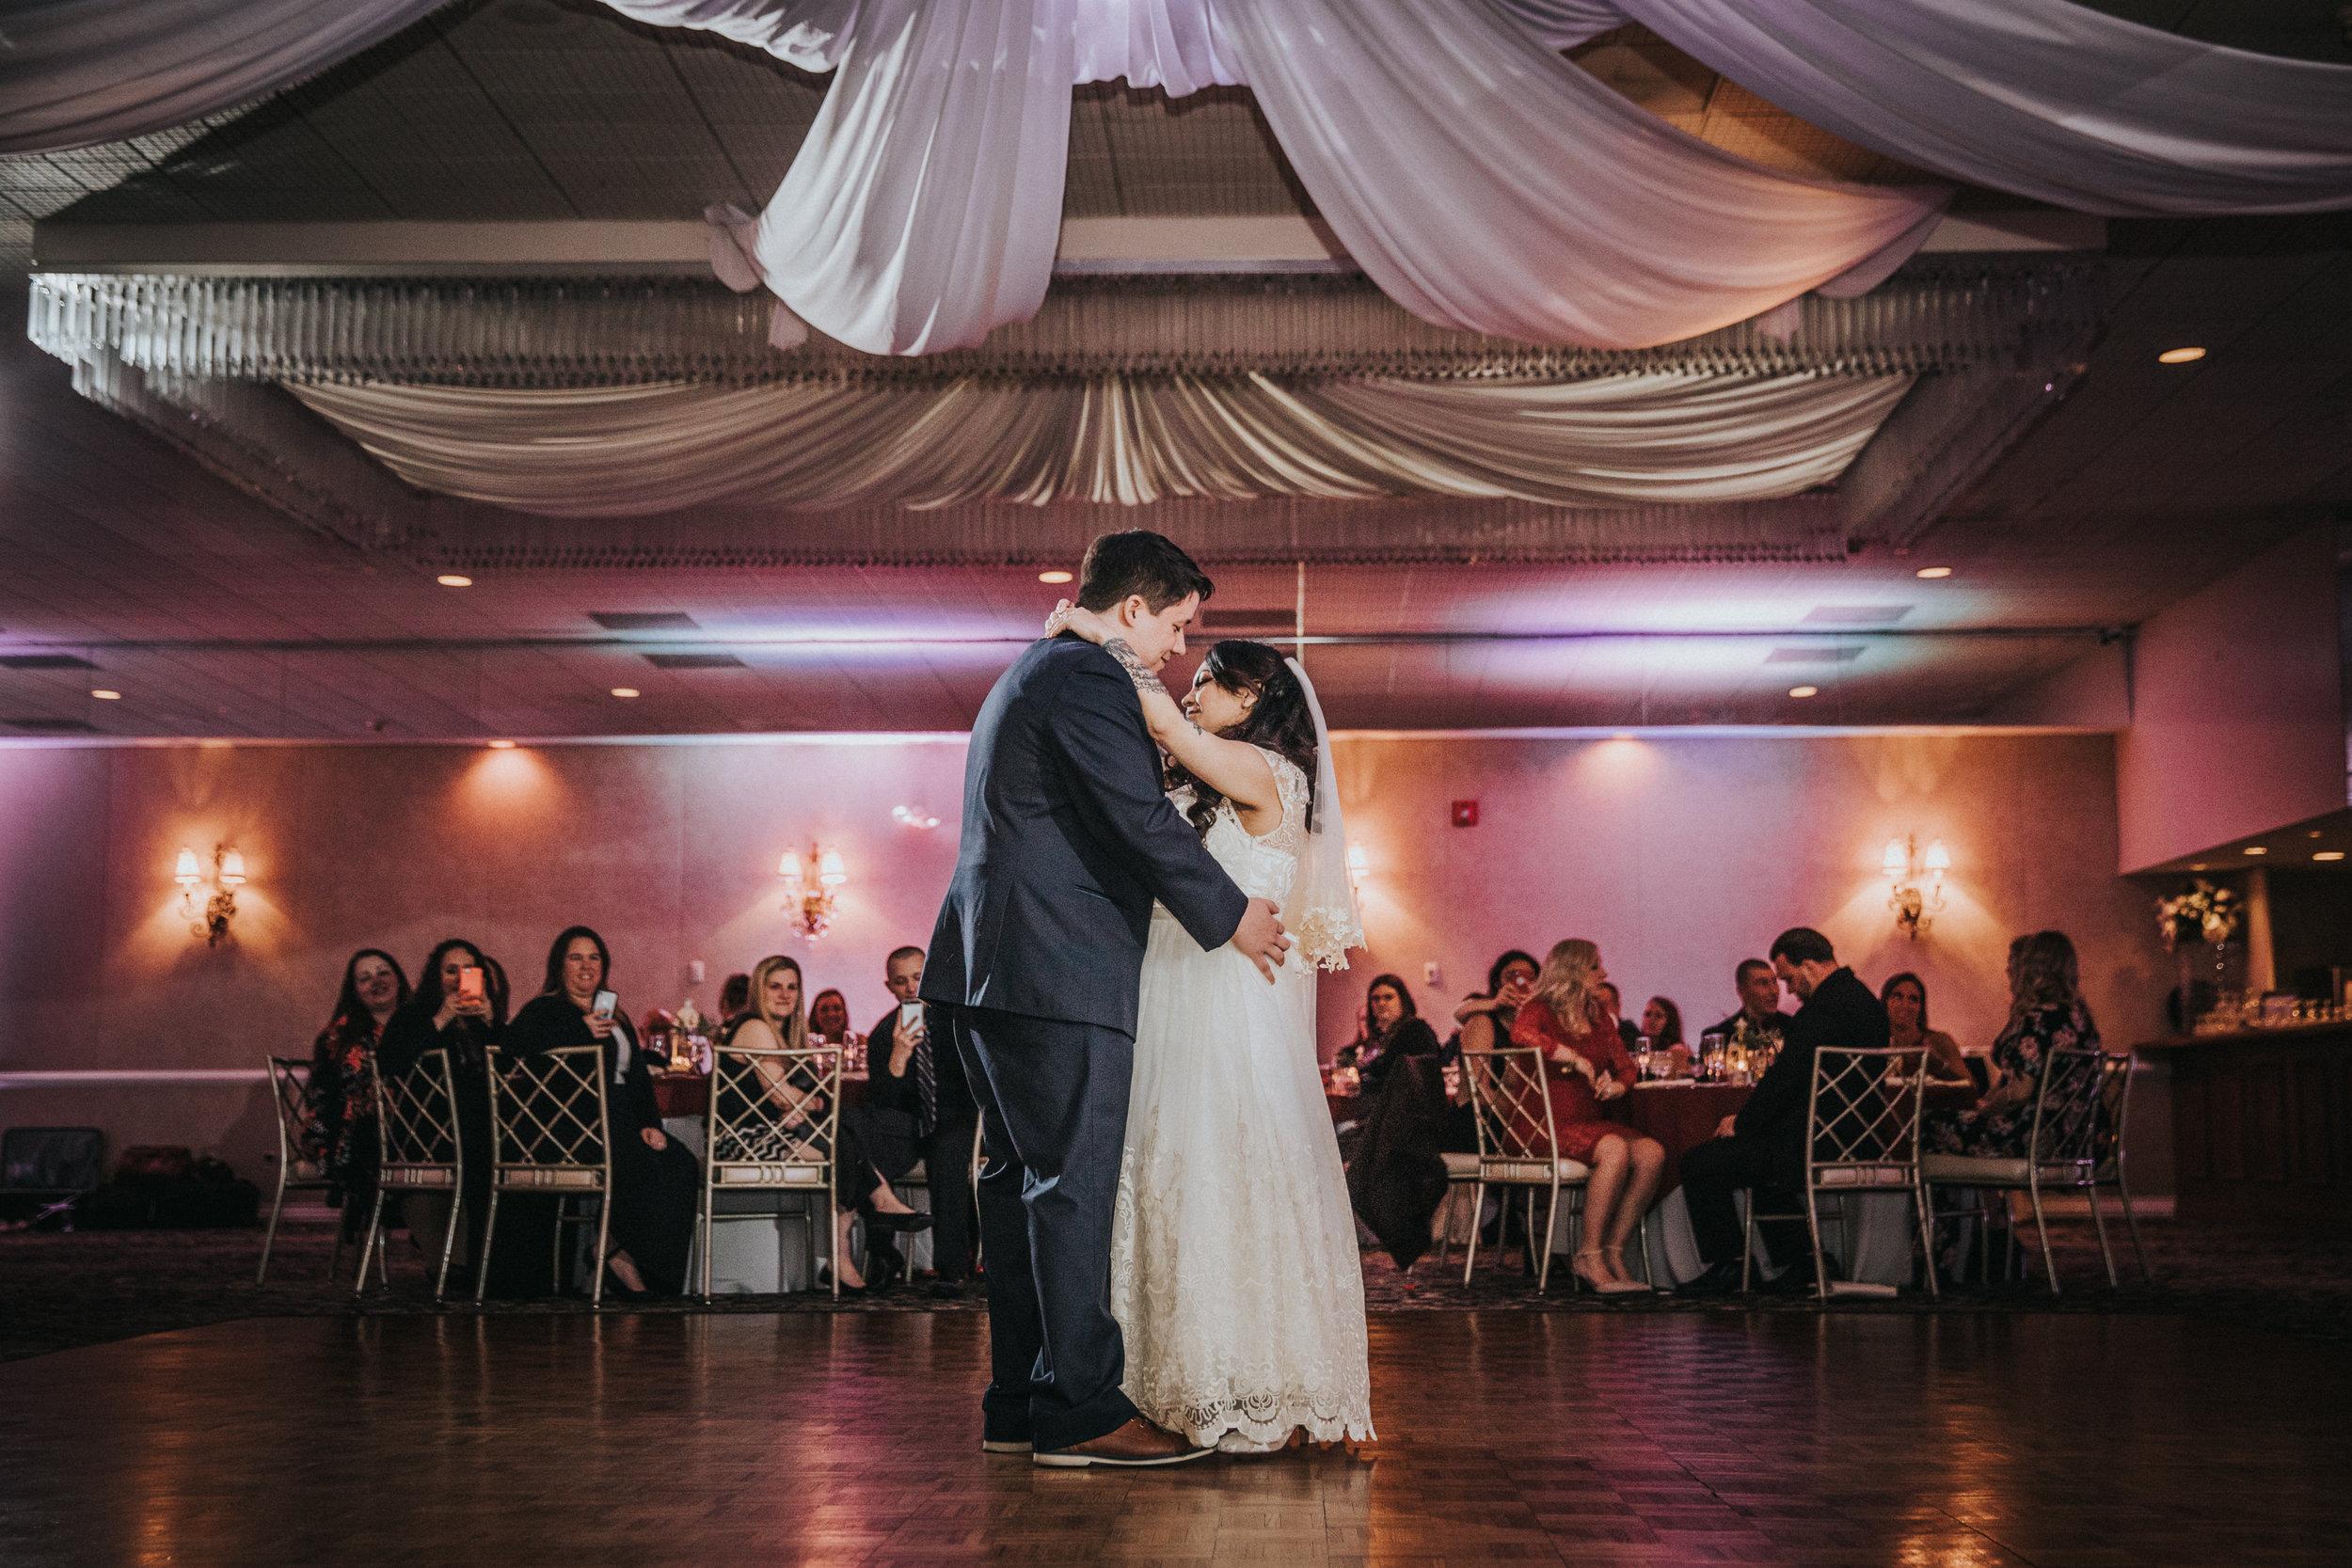 New-Jersey-Wedding-Photographer-ReceptionCenter-Valeria&Mike-Reception (70 of 265).jpg